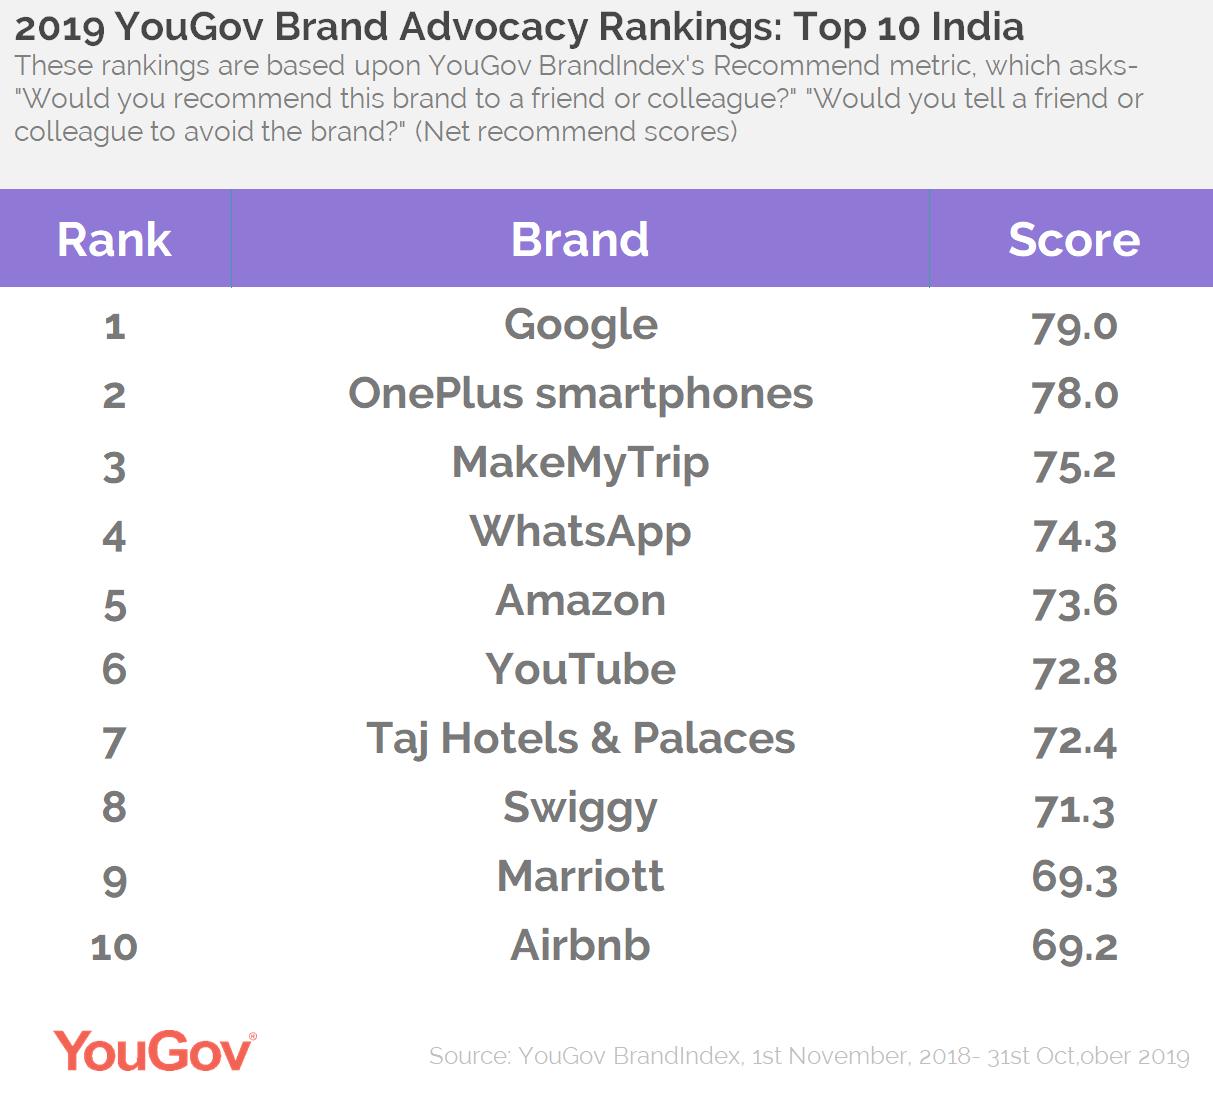 2019 Brand Advocacy- Top 10 India